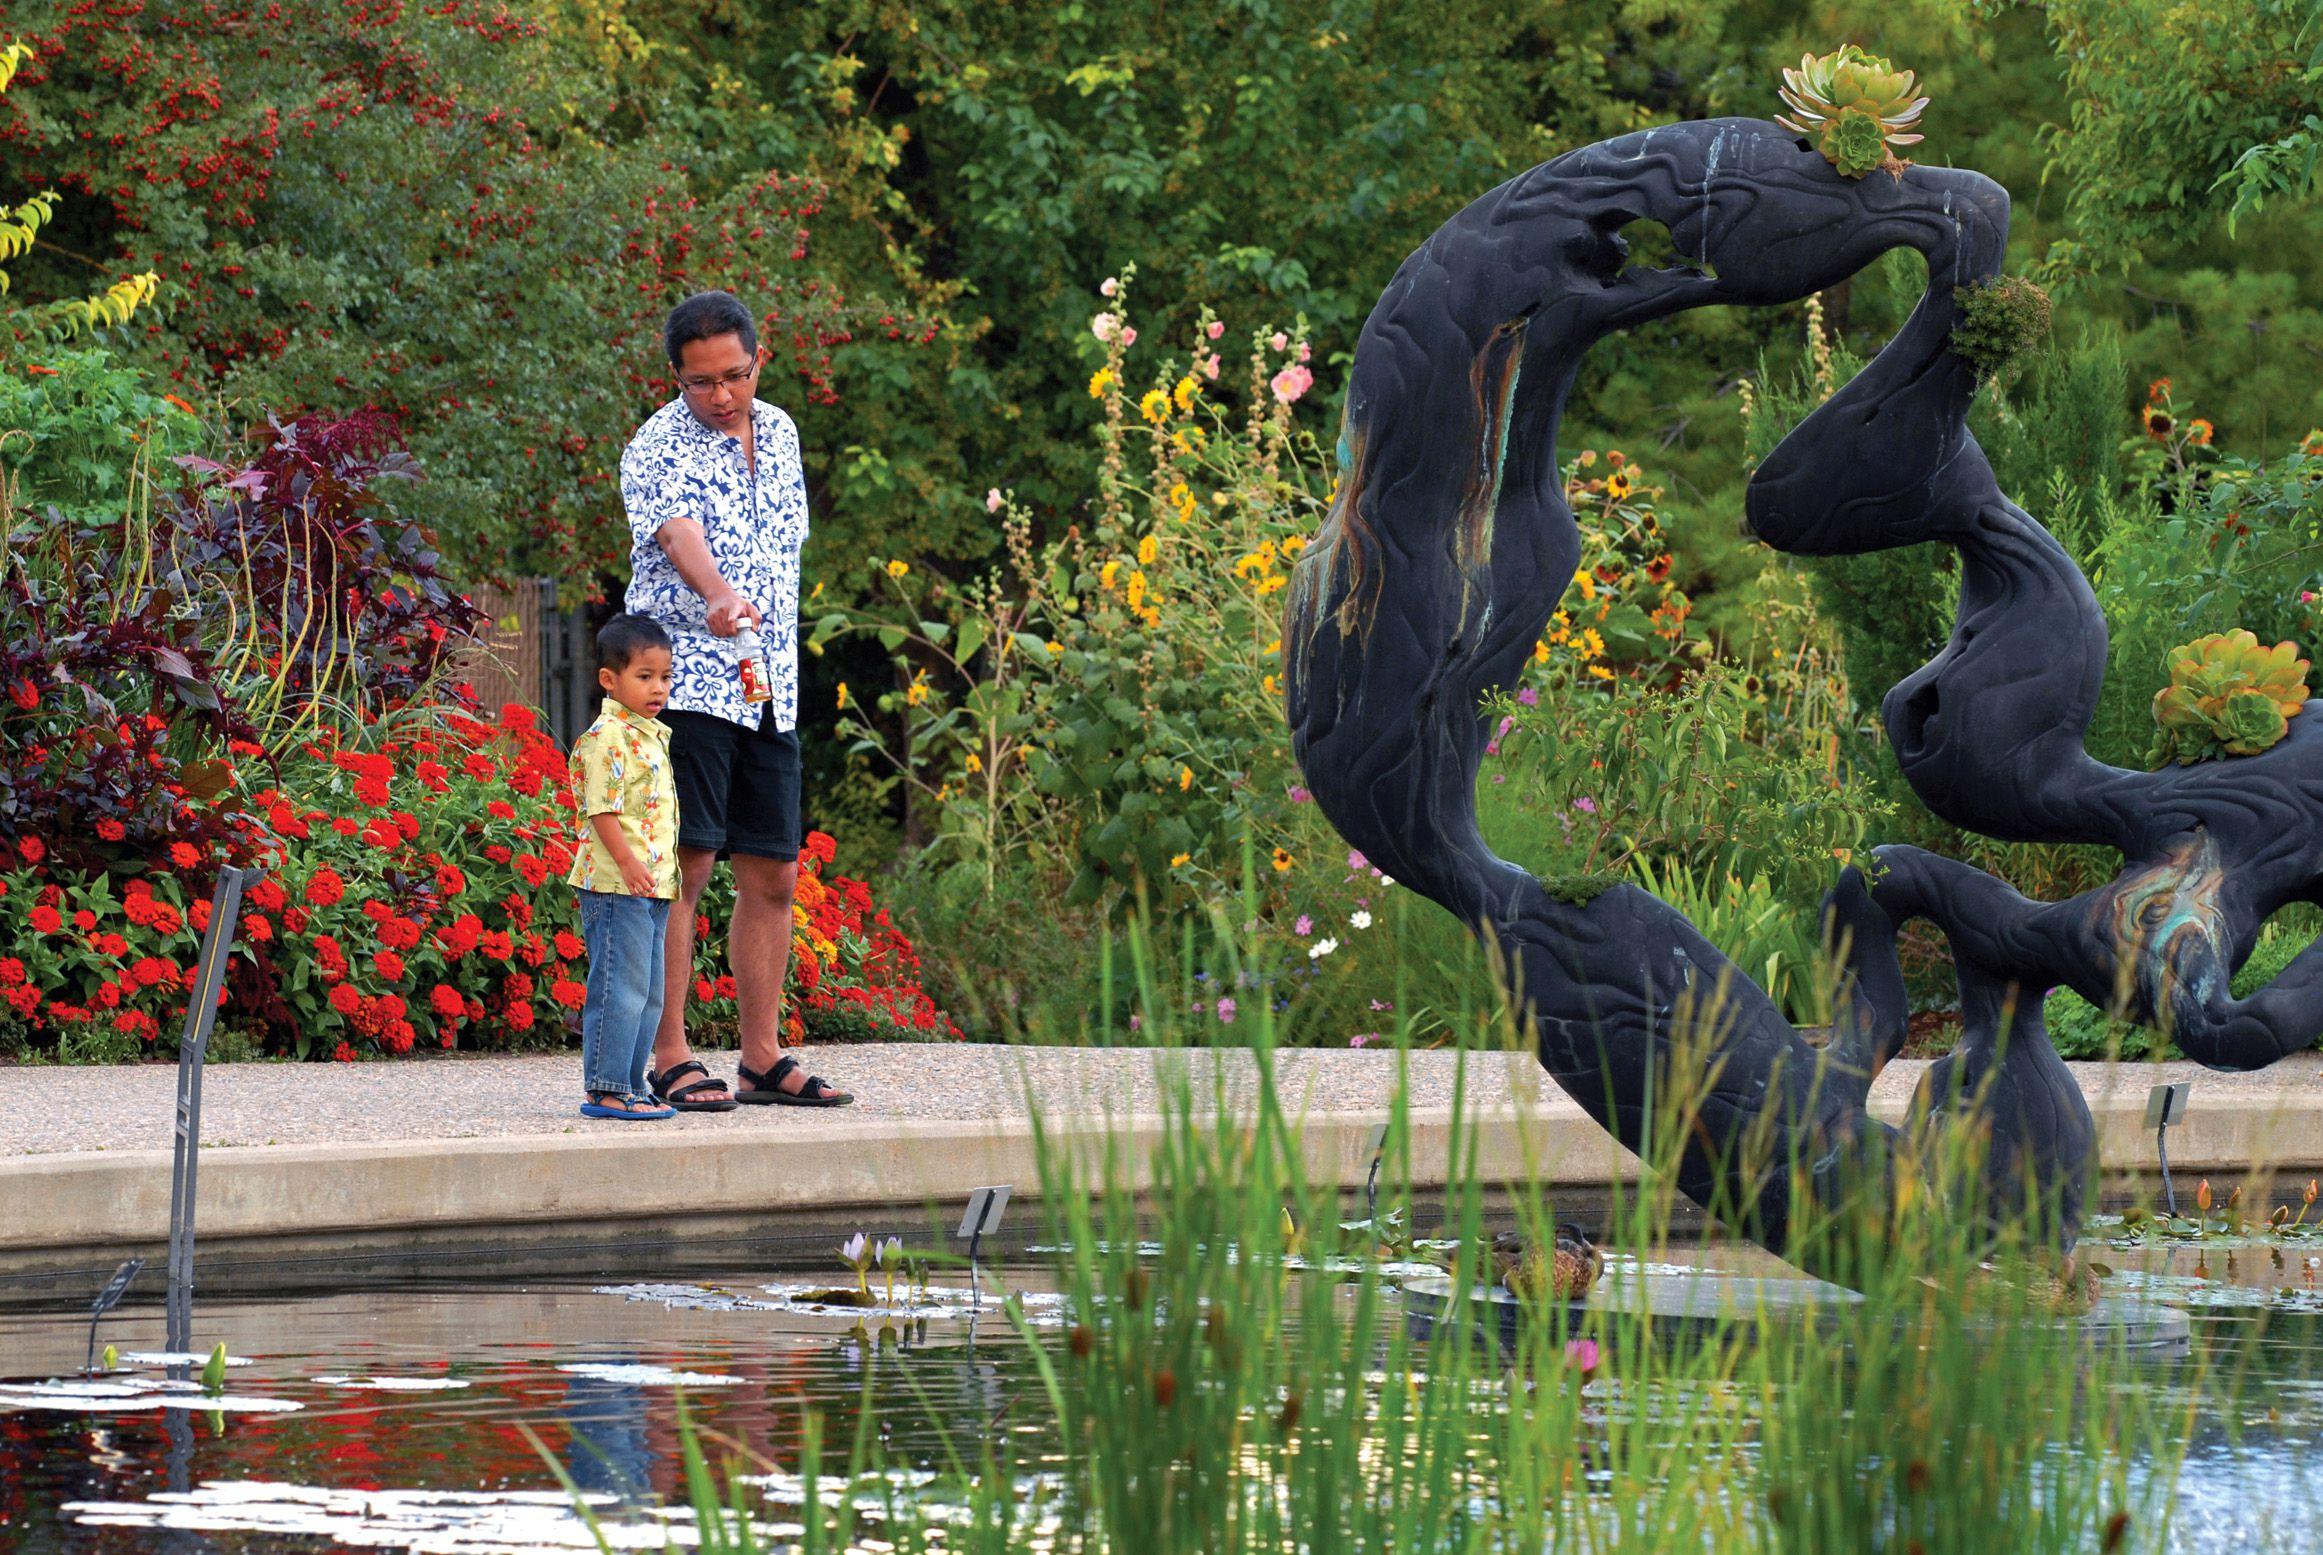 The Denver Botanic Gardens